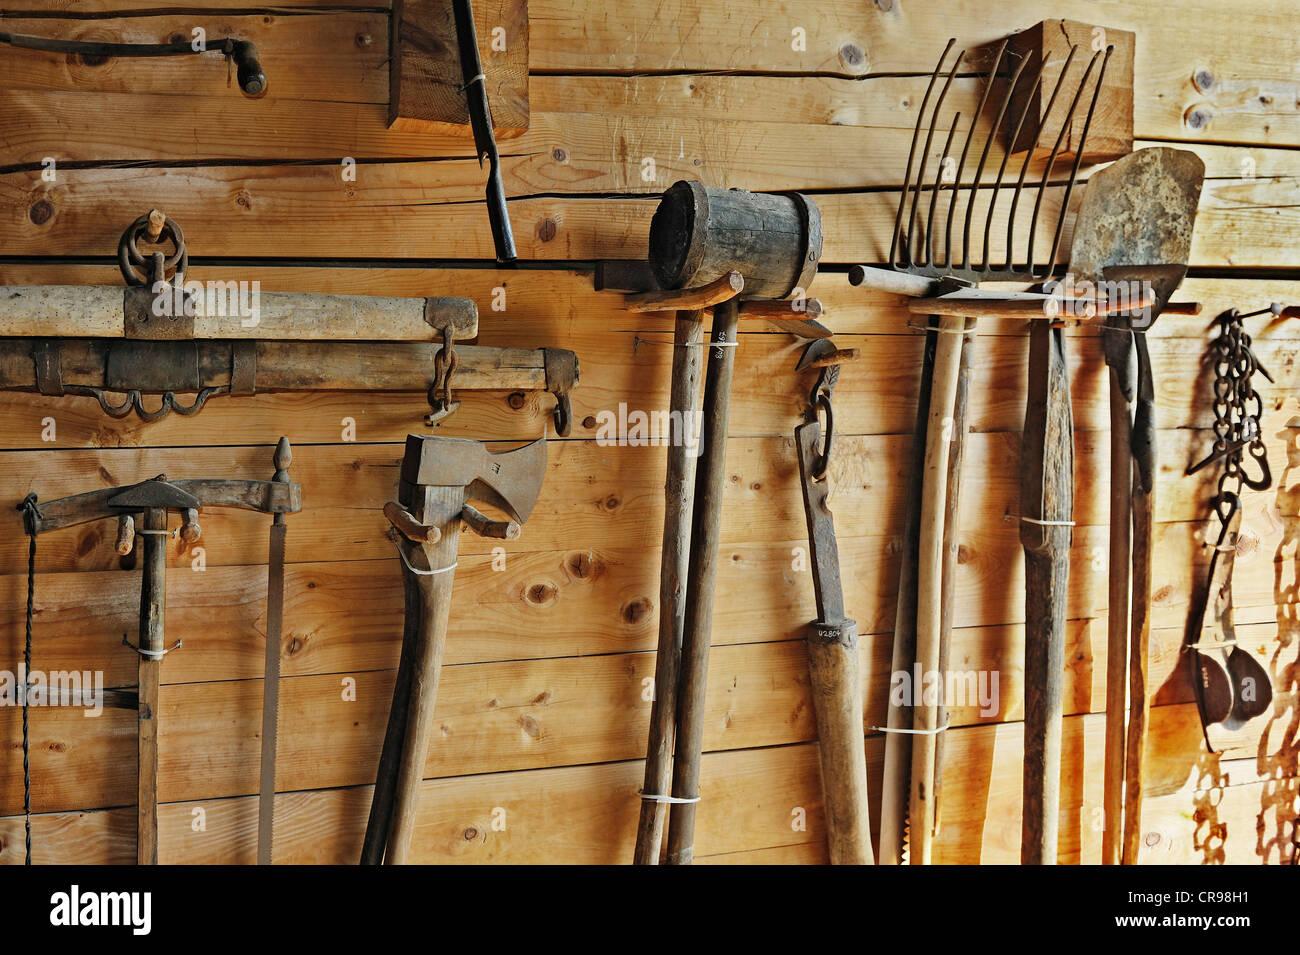 Garden tools, Haeuslmannhof farm, Bauernhausmuseum Amerang farmhouse museum, Amerang, Bavaria, Germany, Europe - Stock Image